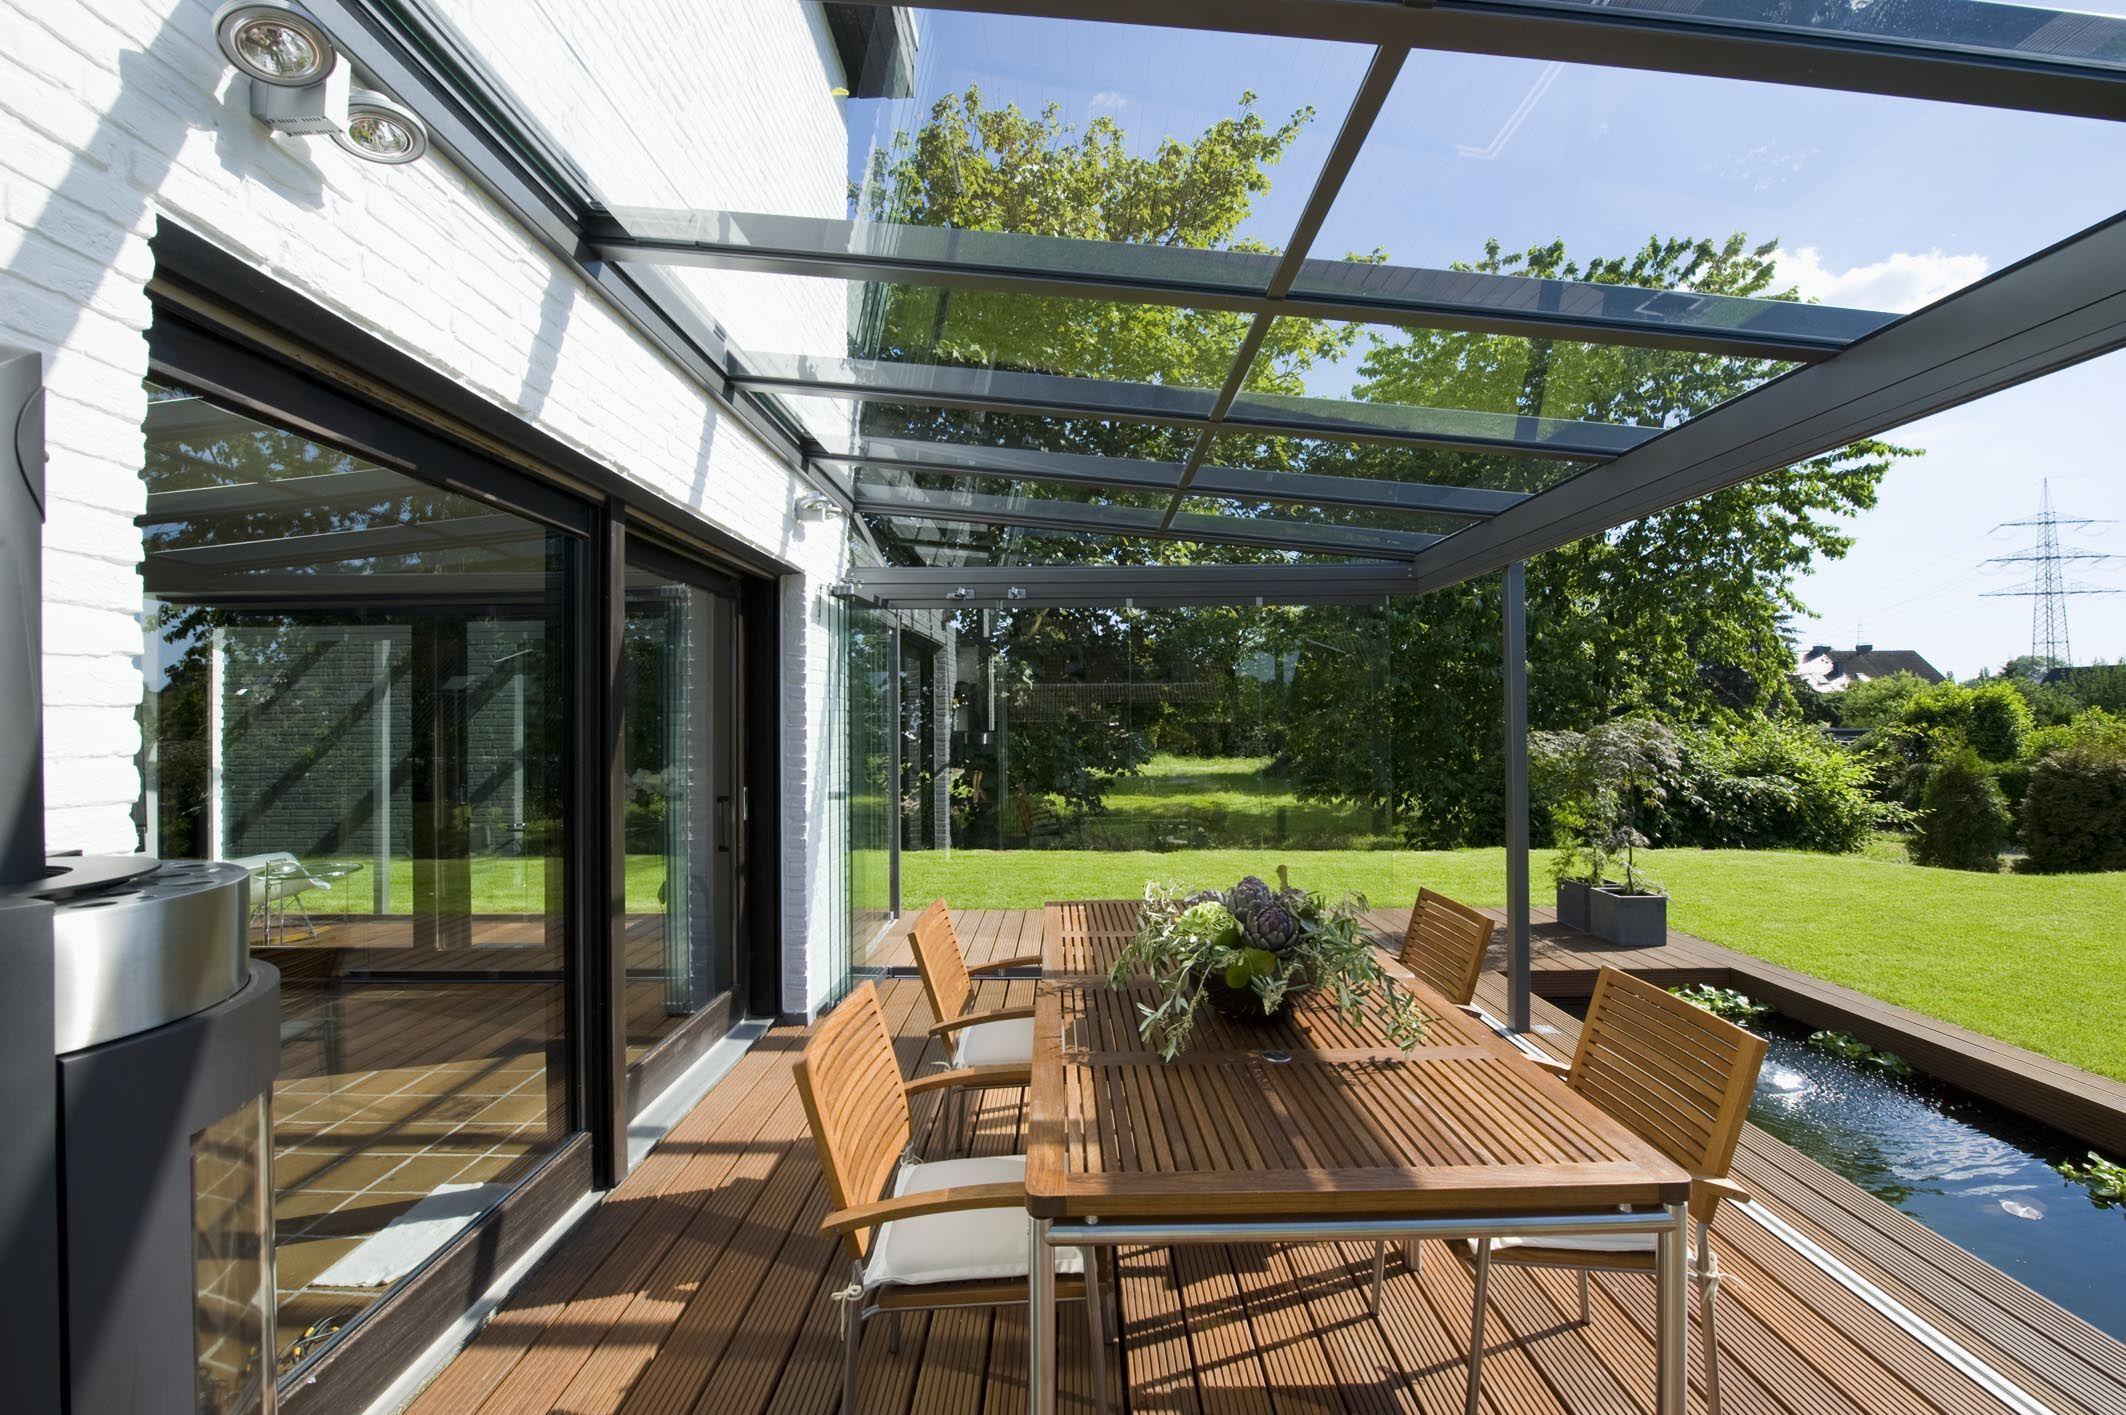 Home design bilder im freien pin by denise on terrasse  pinterest  patios and room